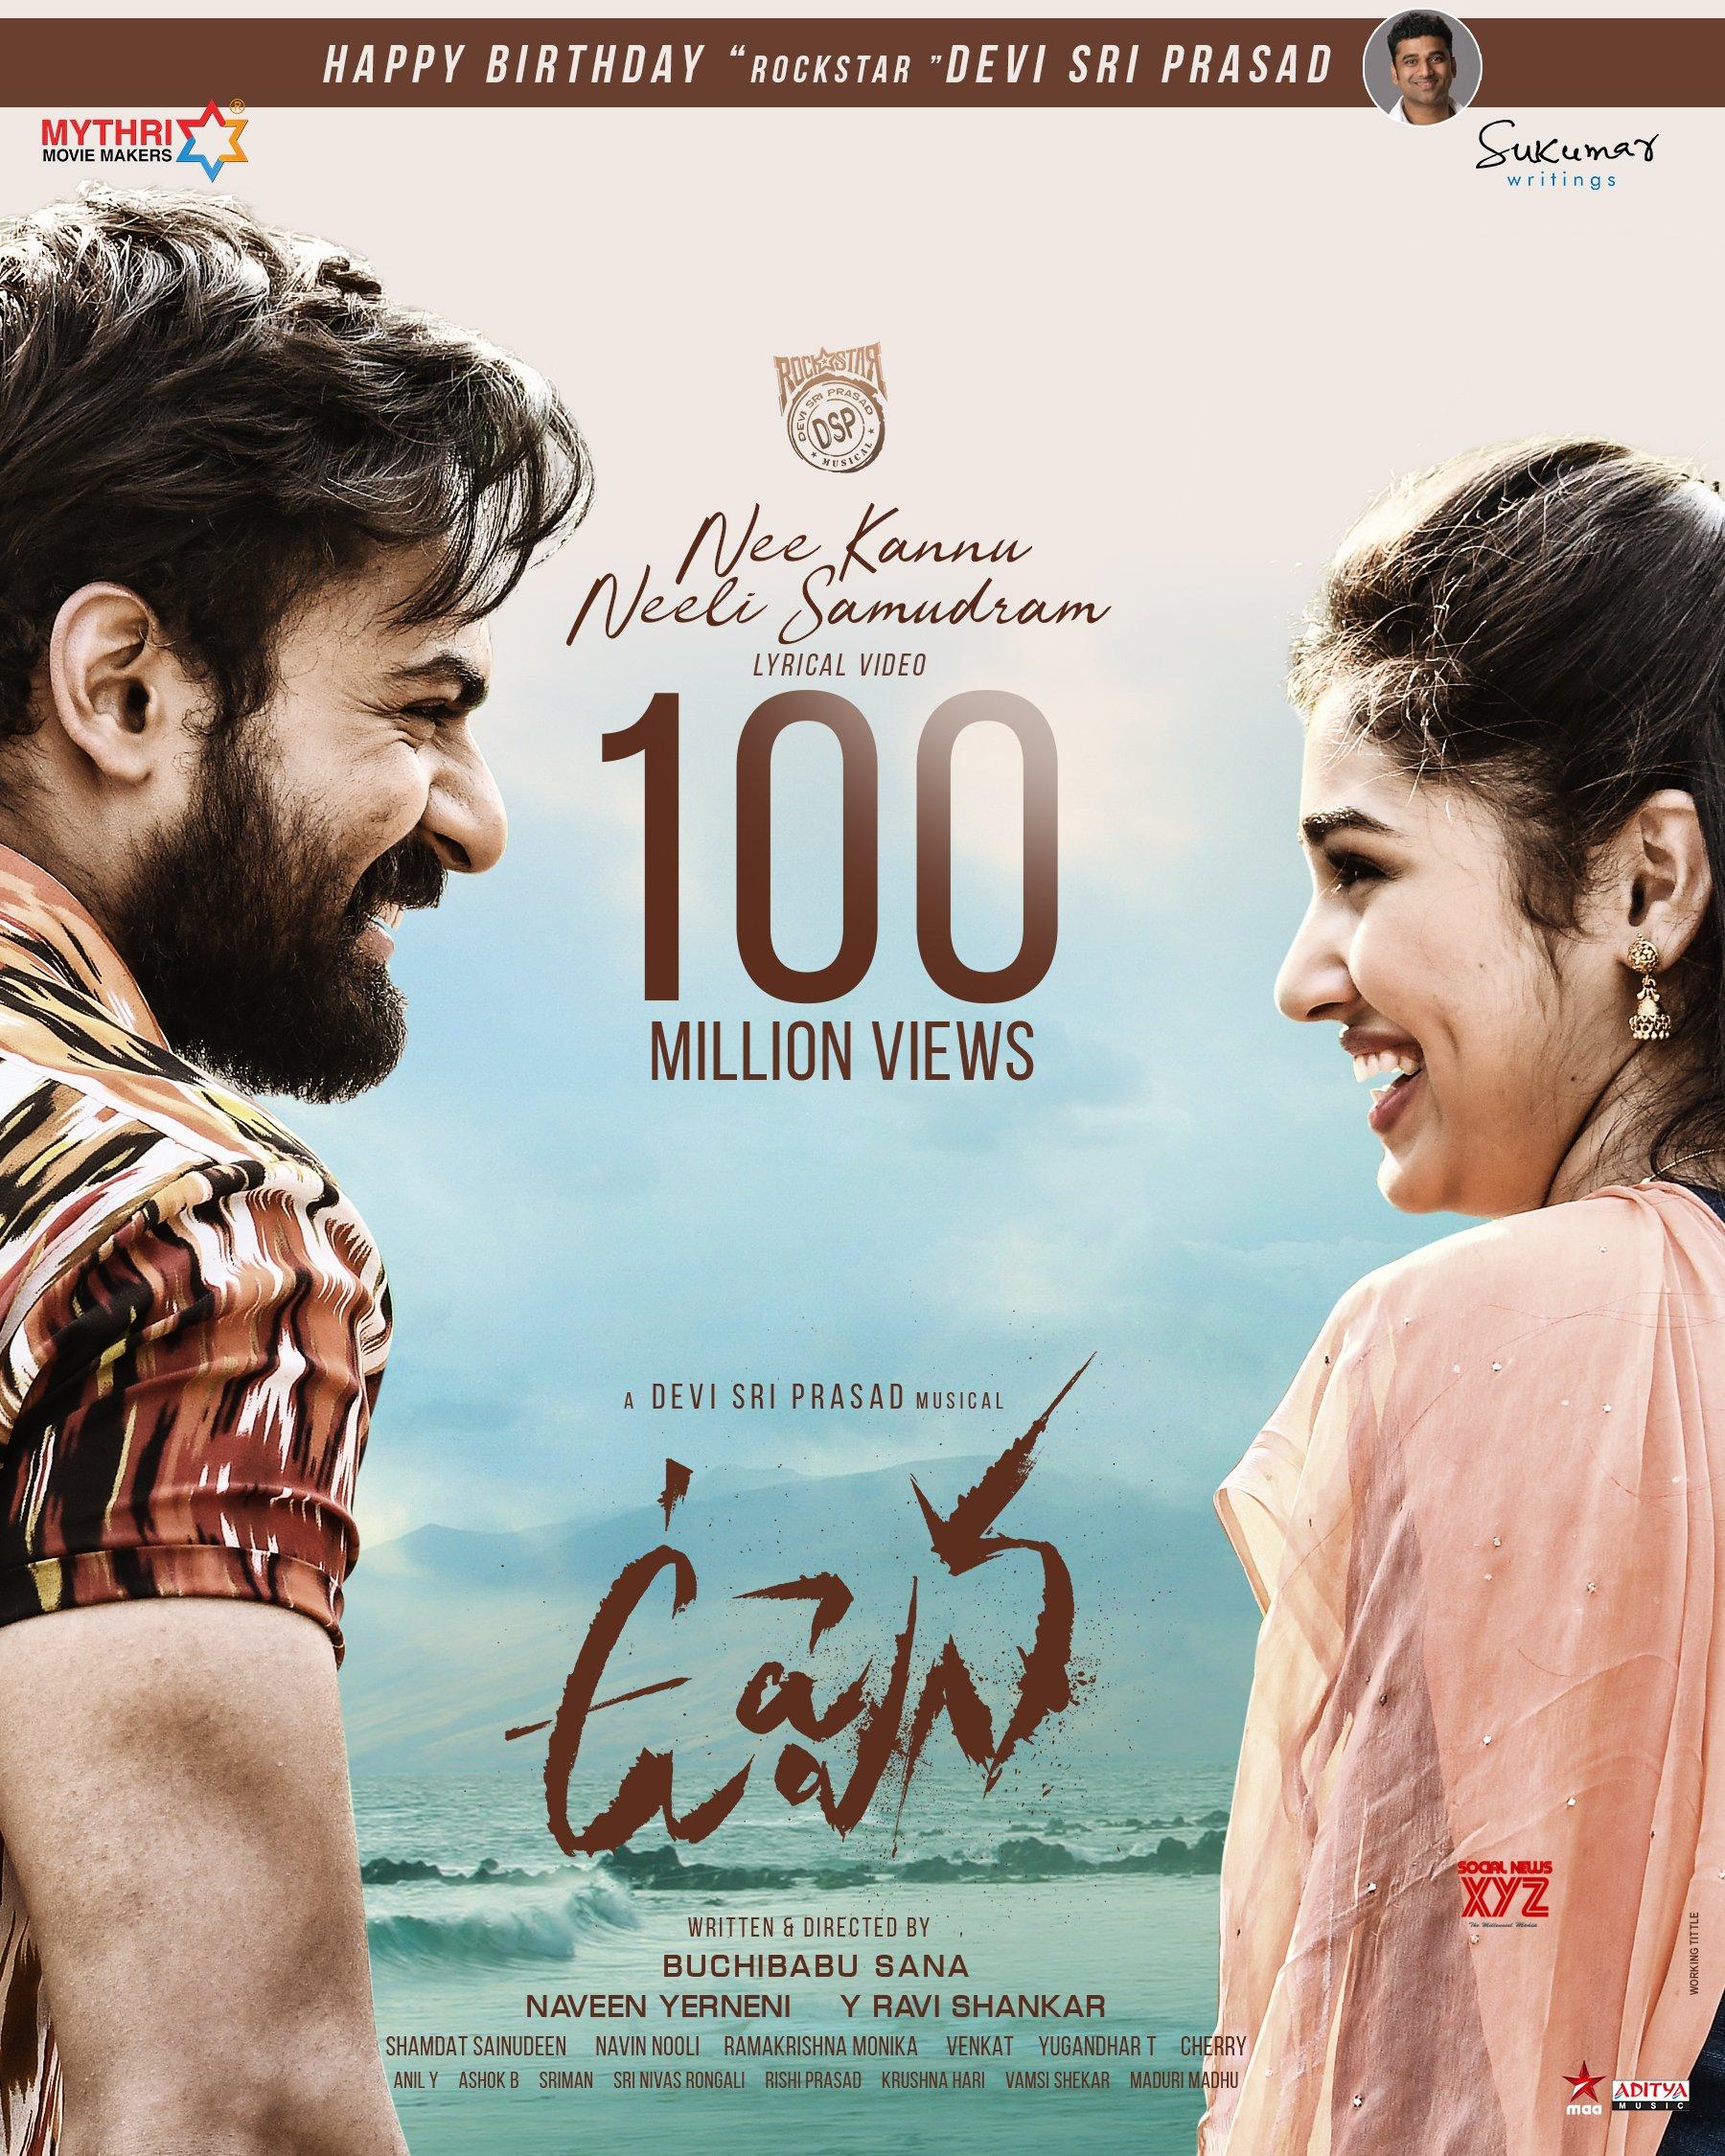 Nee Kallu Neeli Samudram Song In Uppena Gets 100 Million Views